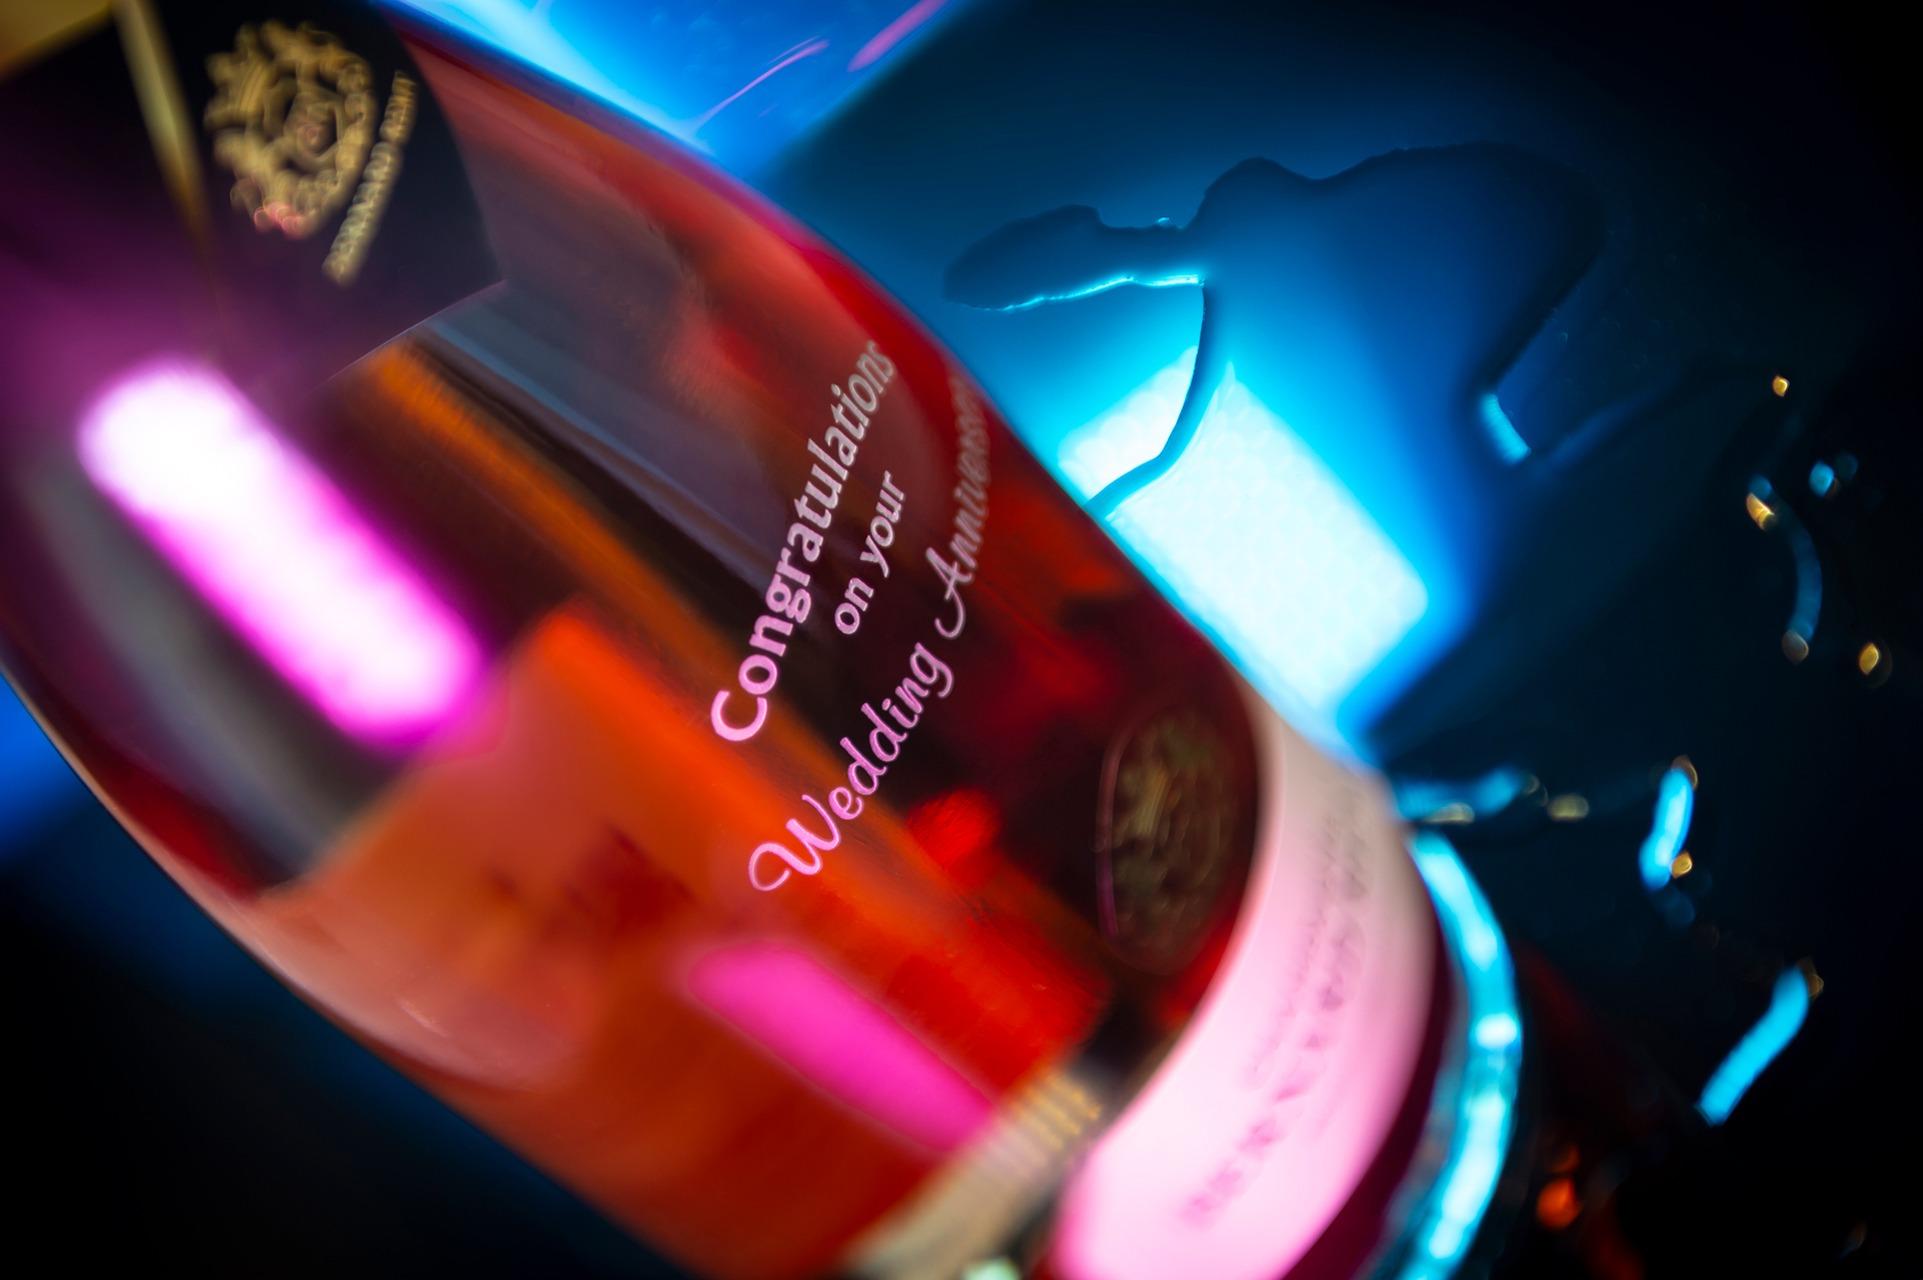 BERNARD-REMY - Engraved Champagne